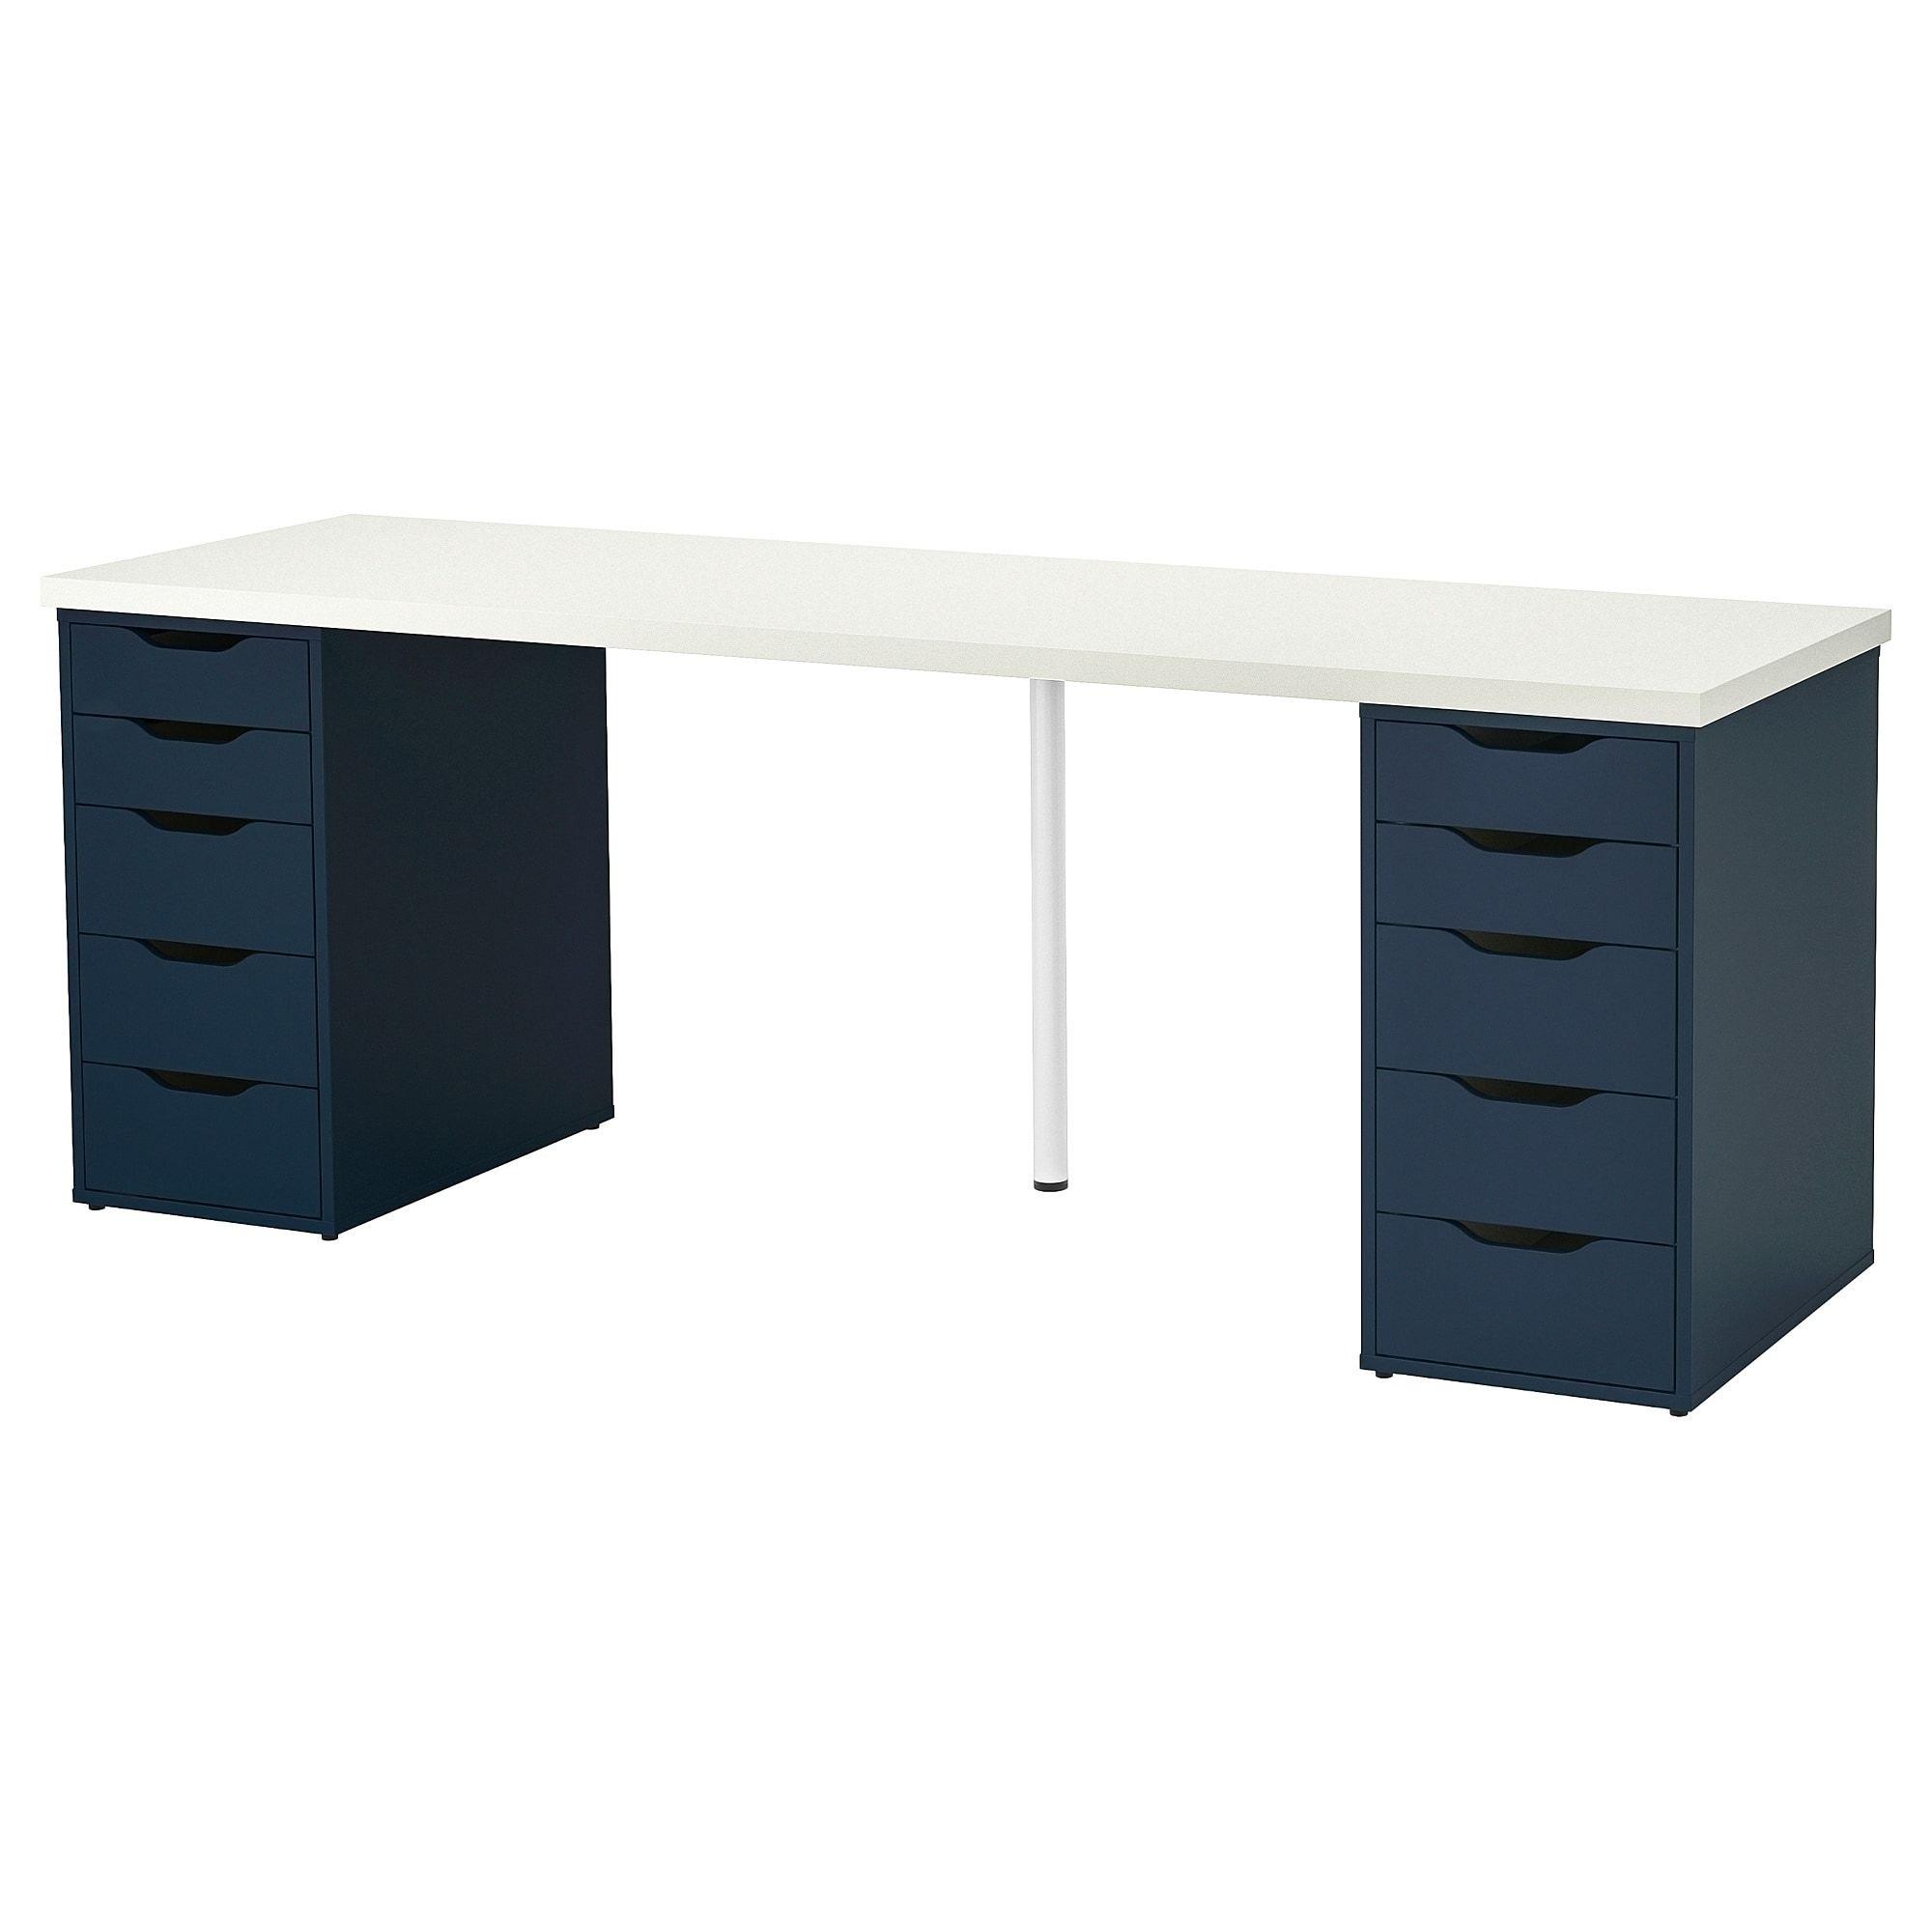 Furniture Home Furnishings Find Your Inspiration Ikea Drawer Unit Kallax Shelving